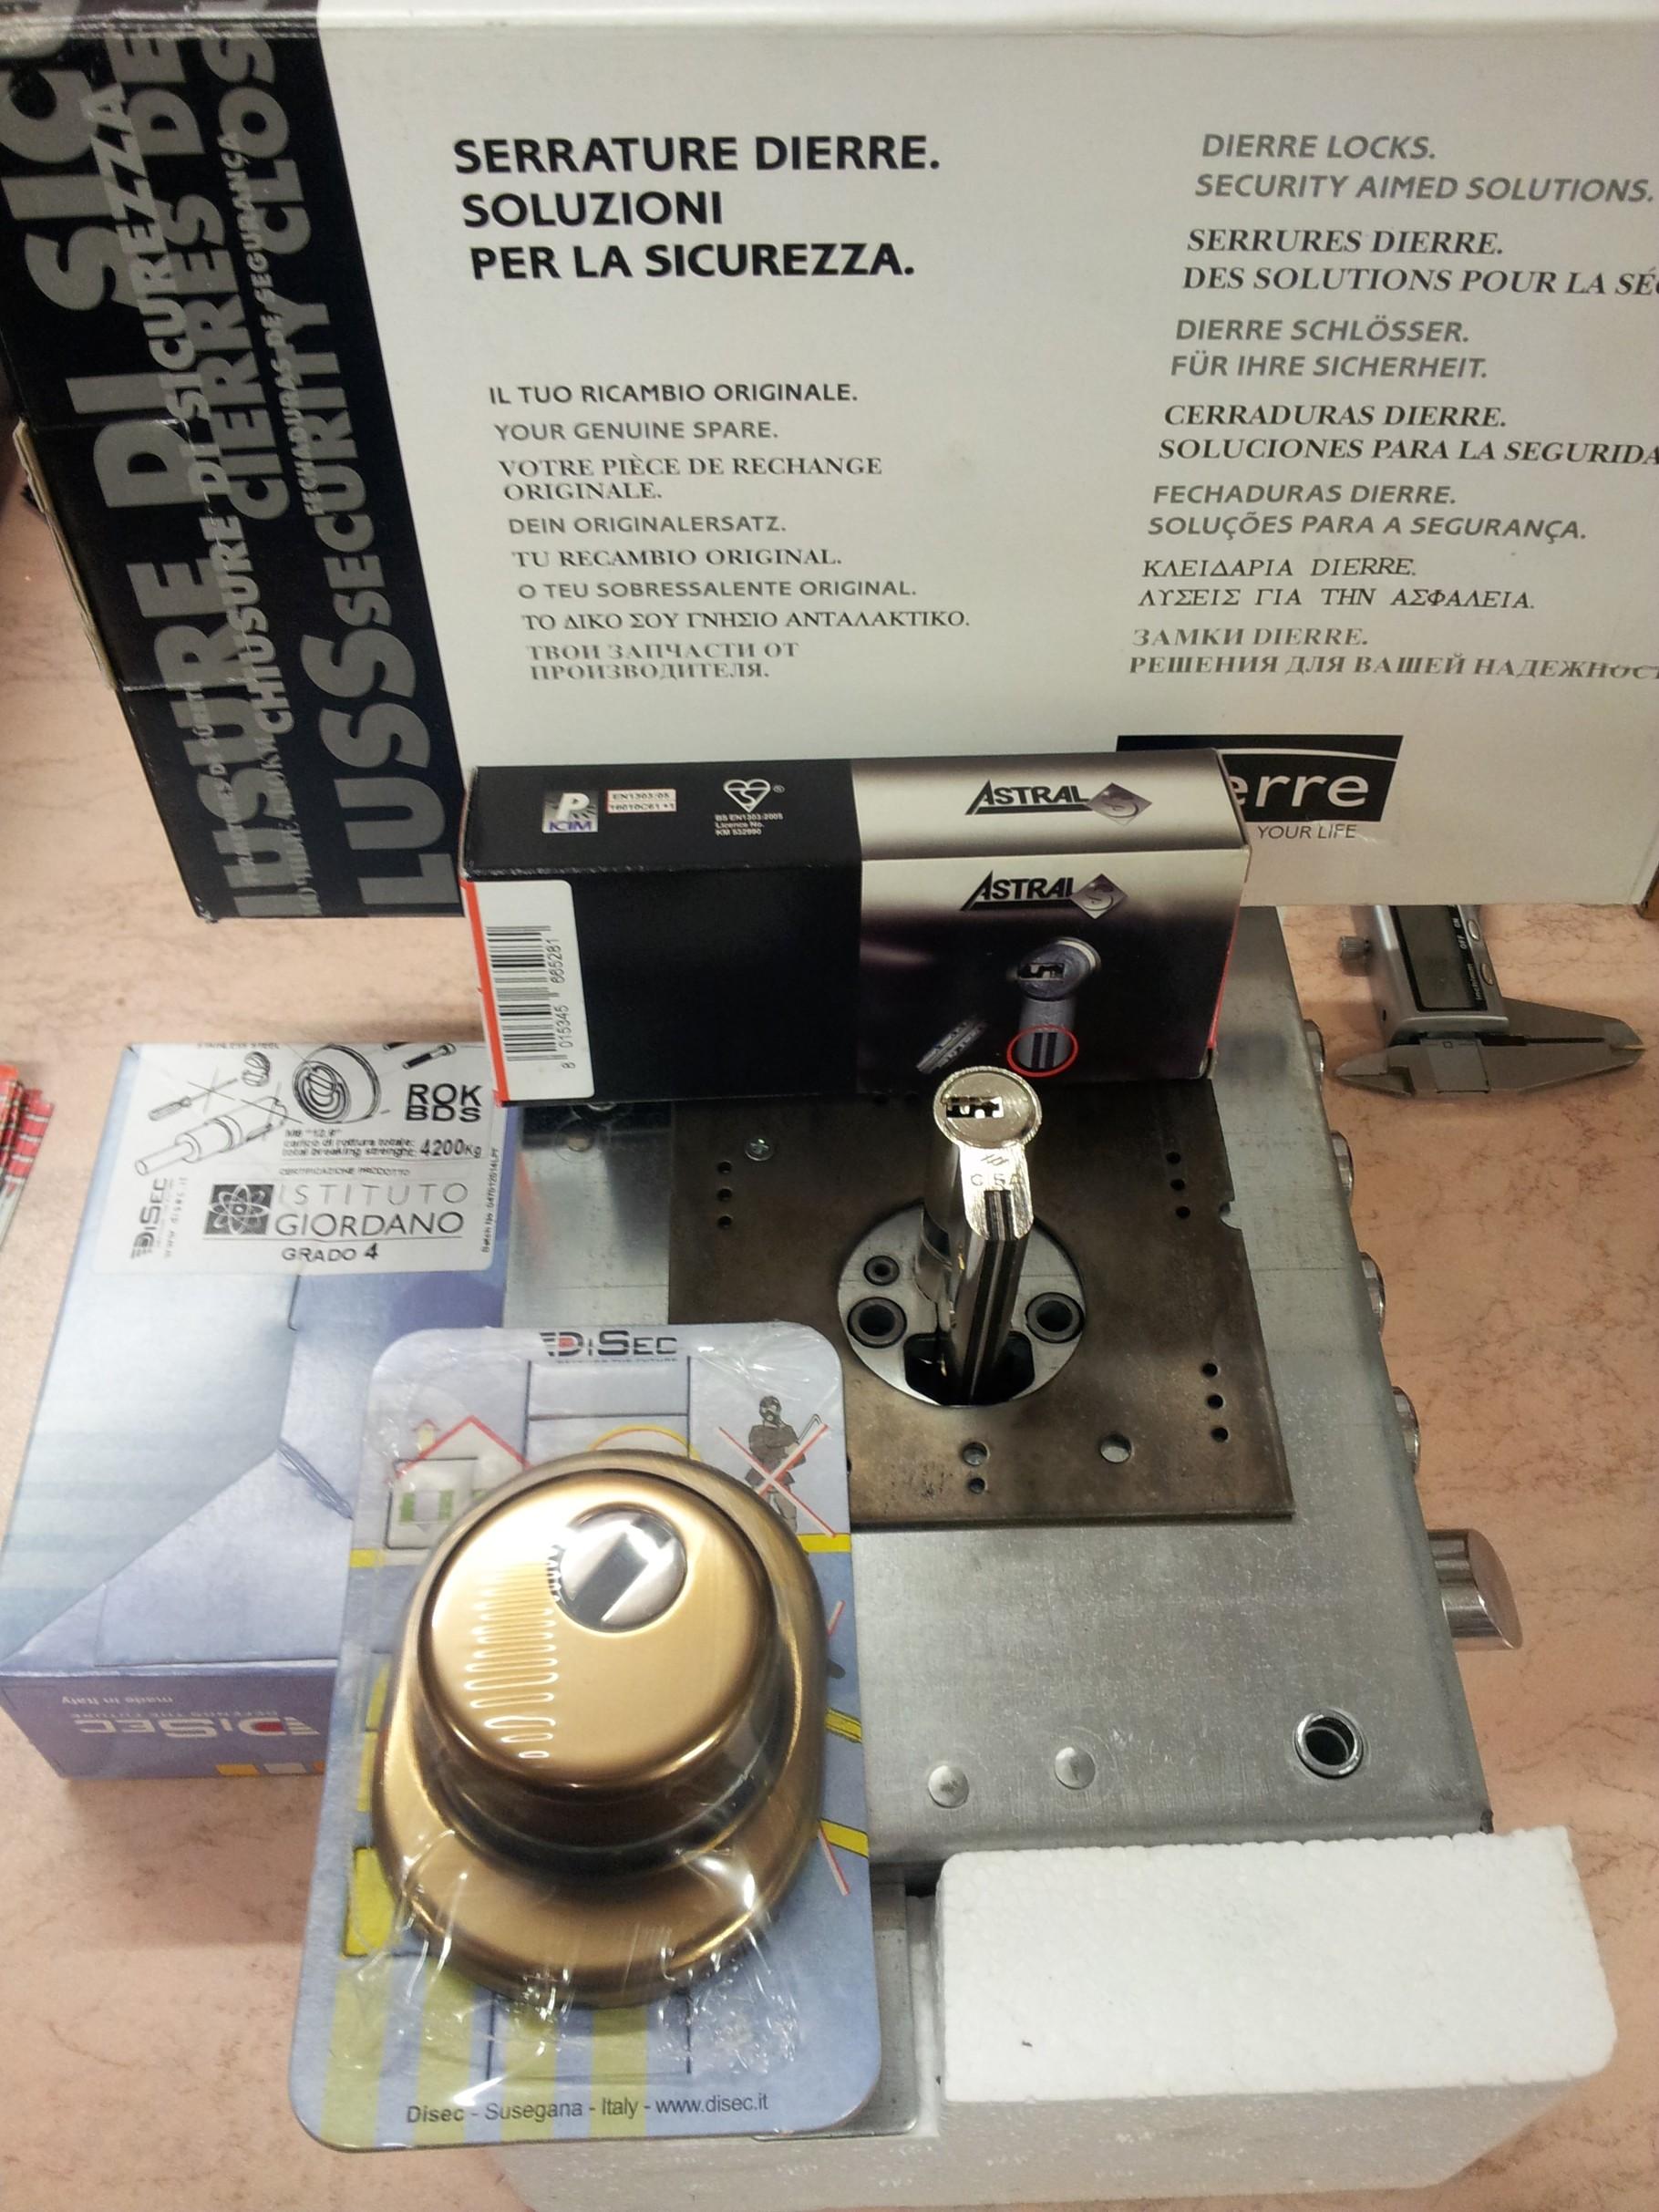 Atra dierre aggiornamento serrature porte blindate ferramenta effepi genova serrature chiavi auto - Effepi porte blindate ...